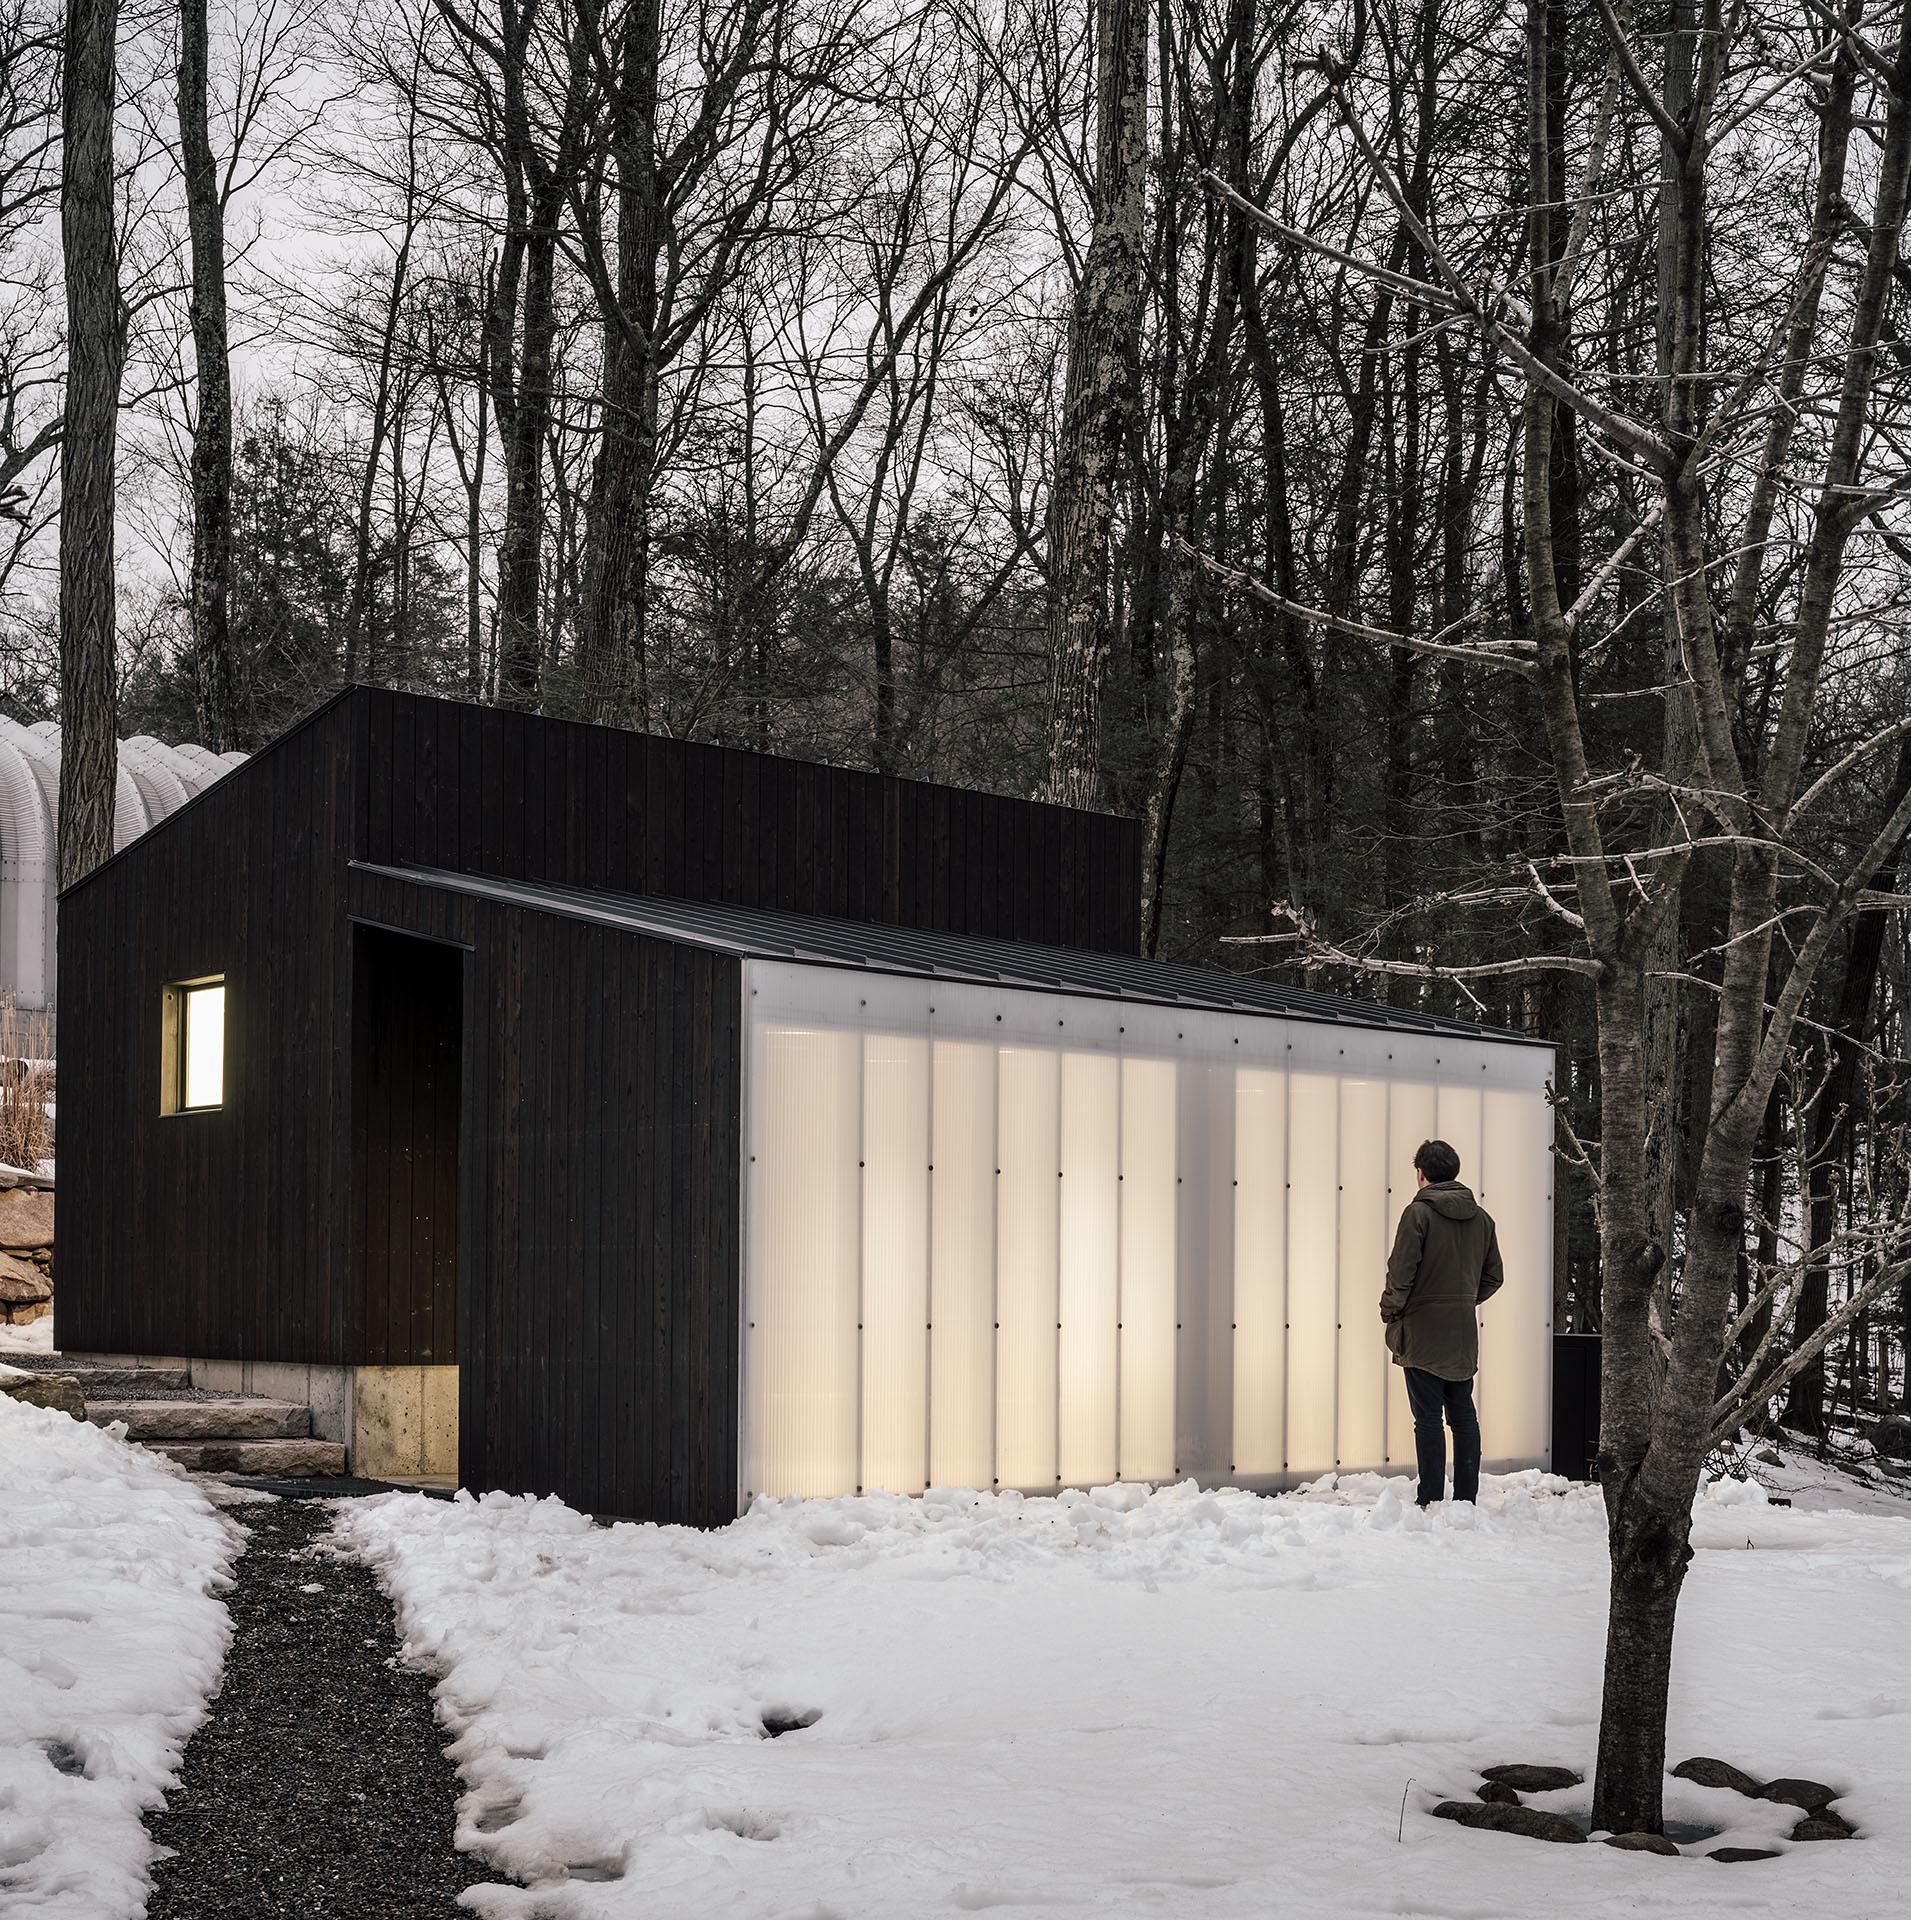 190313 Quismondo small wooden pavilion 005